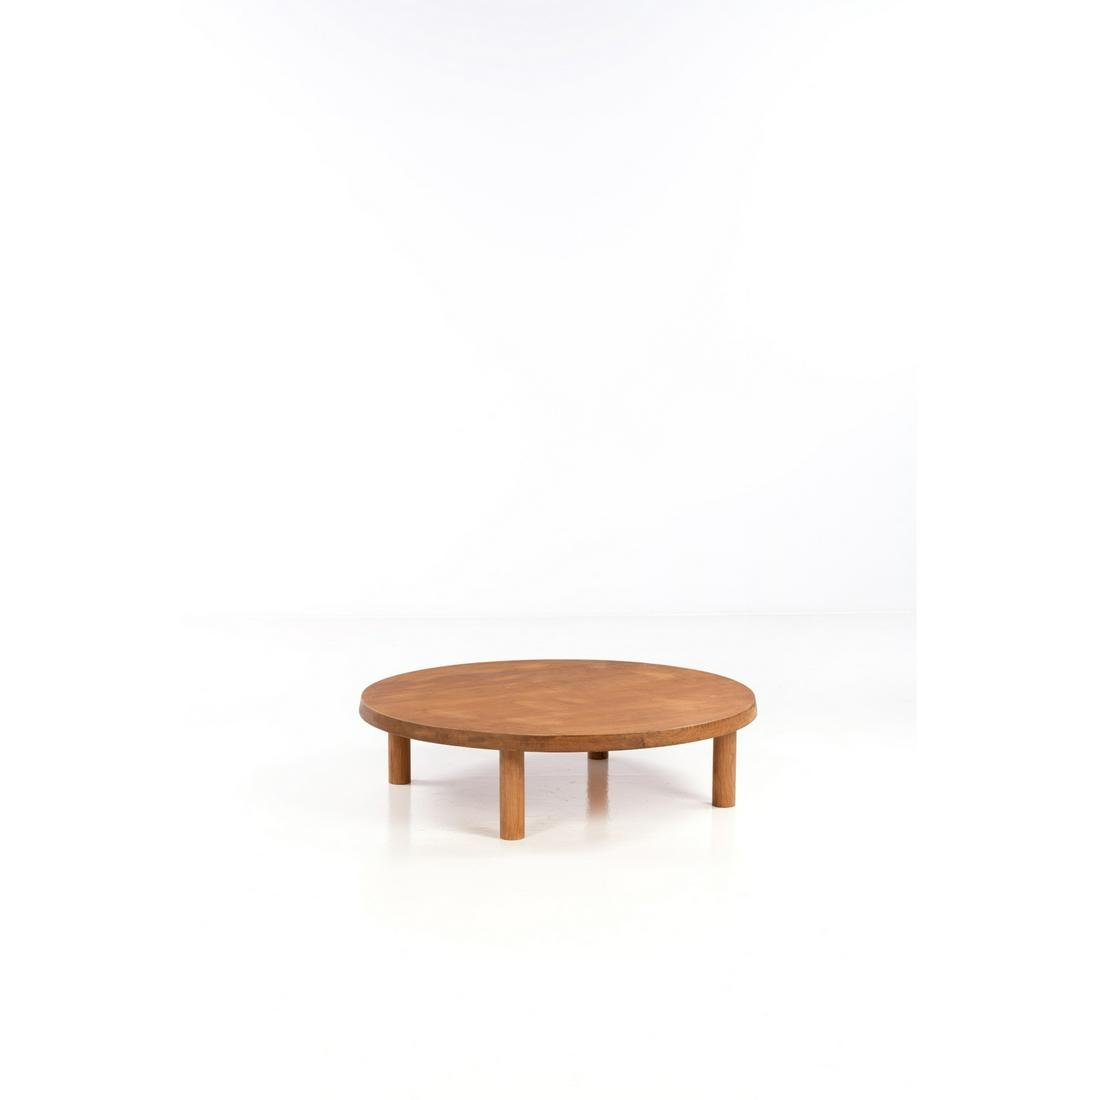 Pierre Chapo (1927-1987) Model no. T02M Coffee table